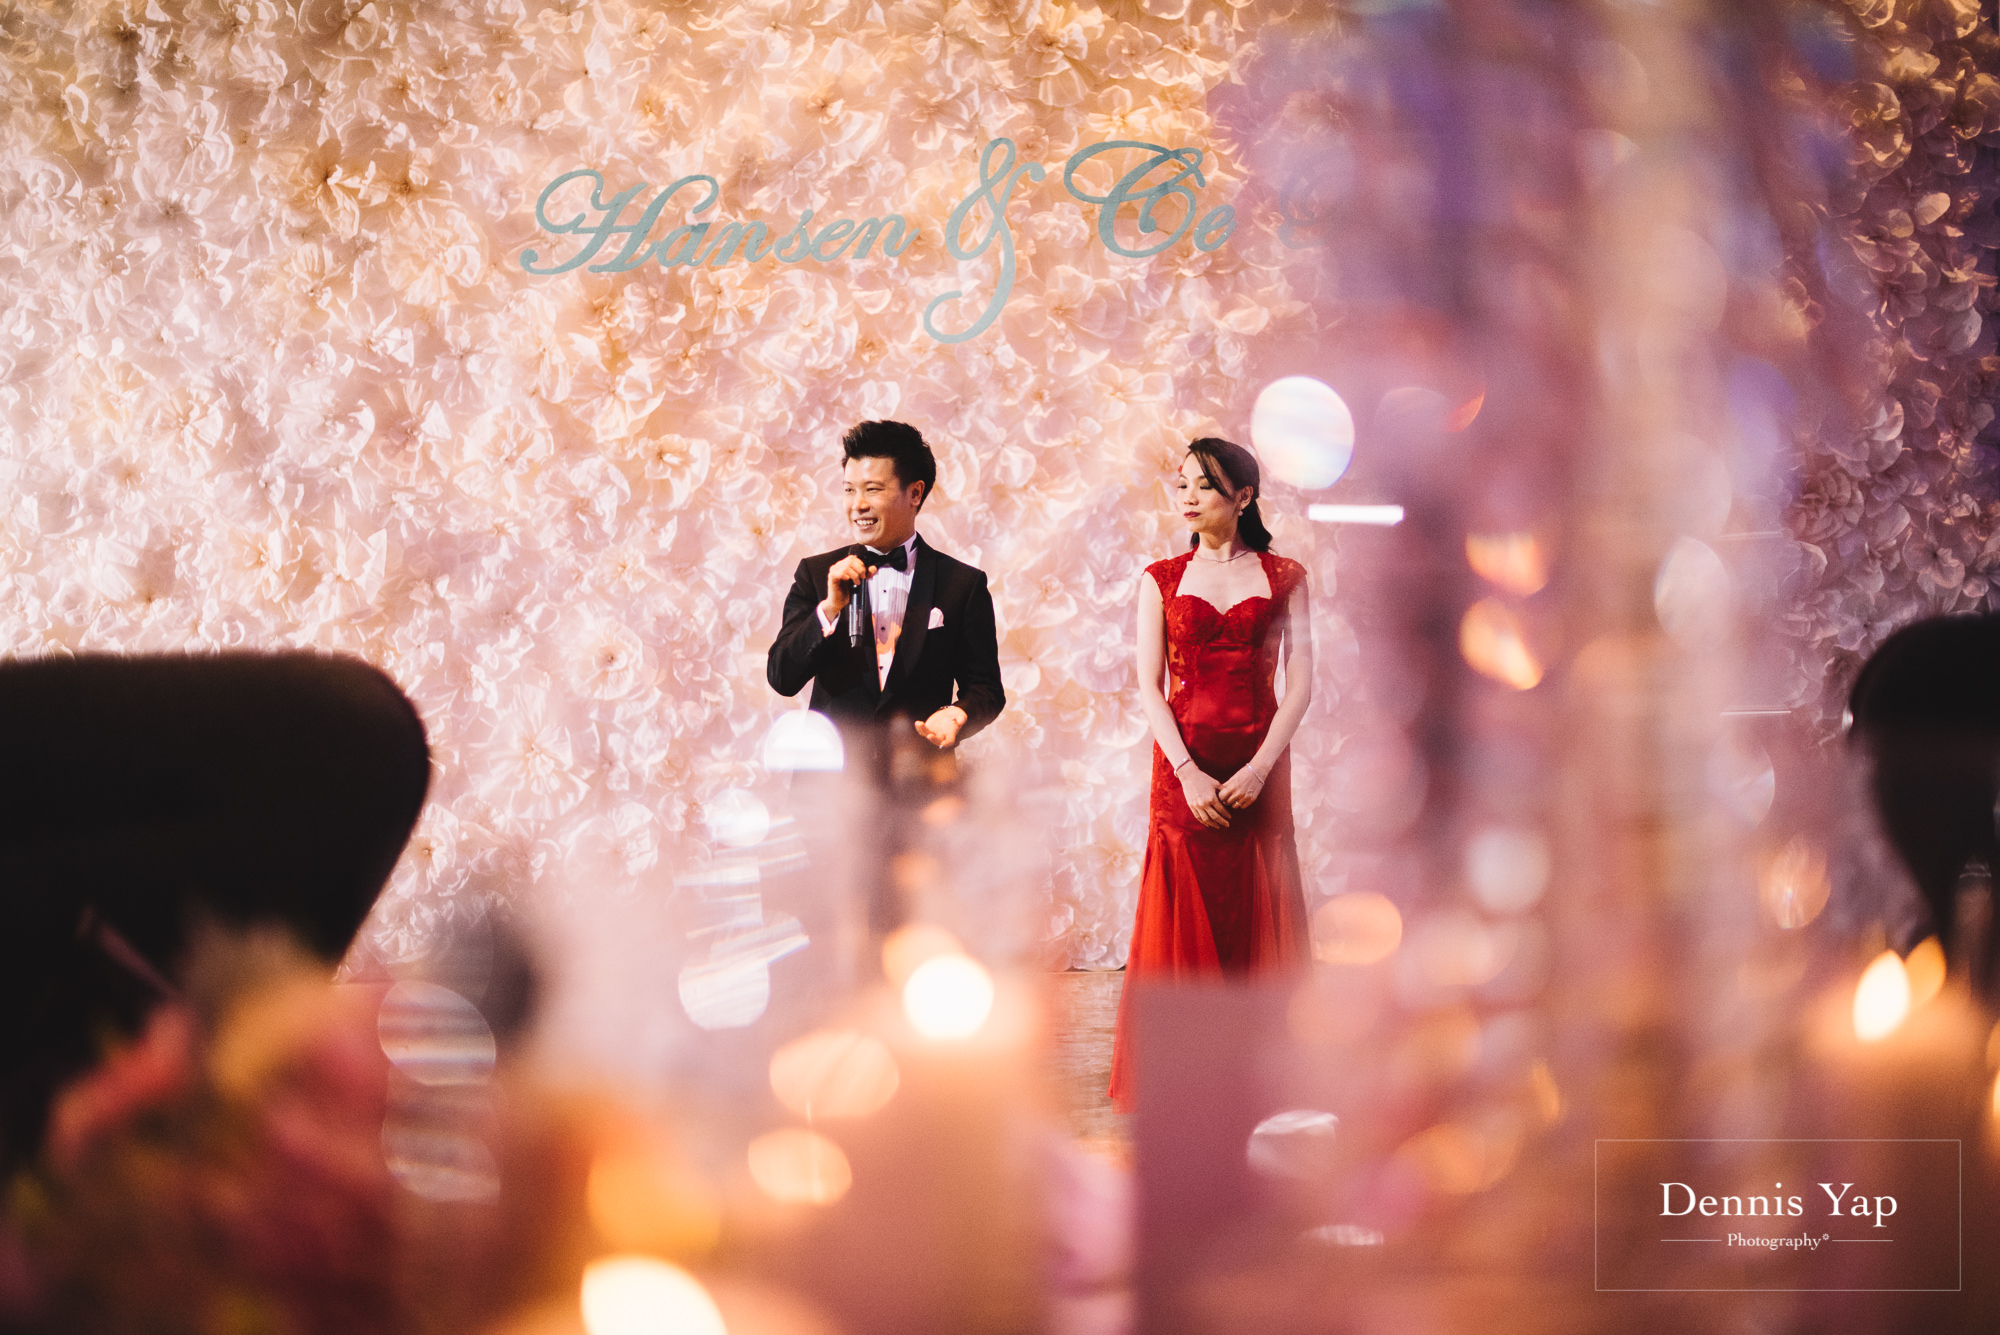 han sen ce pei wedding day A loft hotel kuala lumpur dennis yap photography-24.jpg